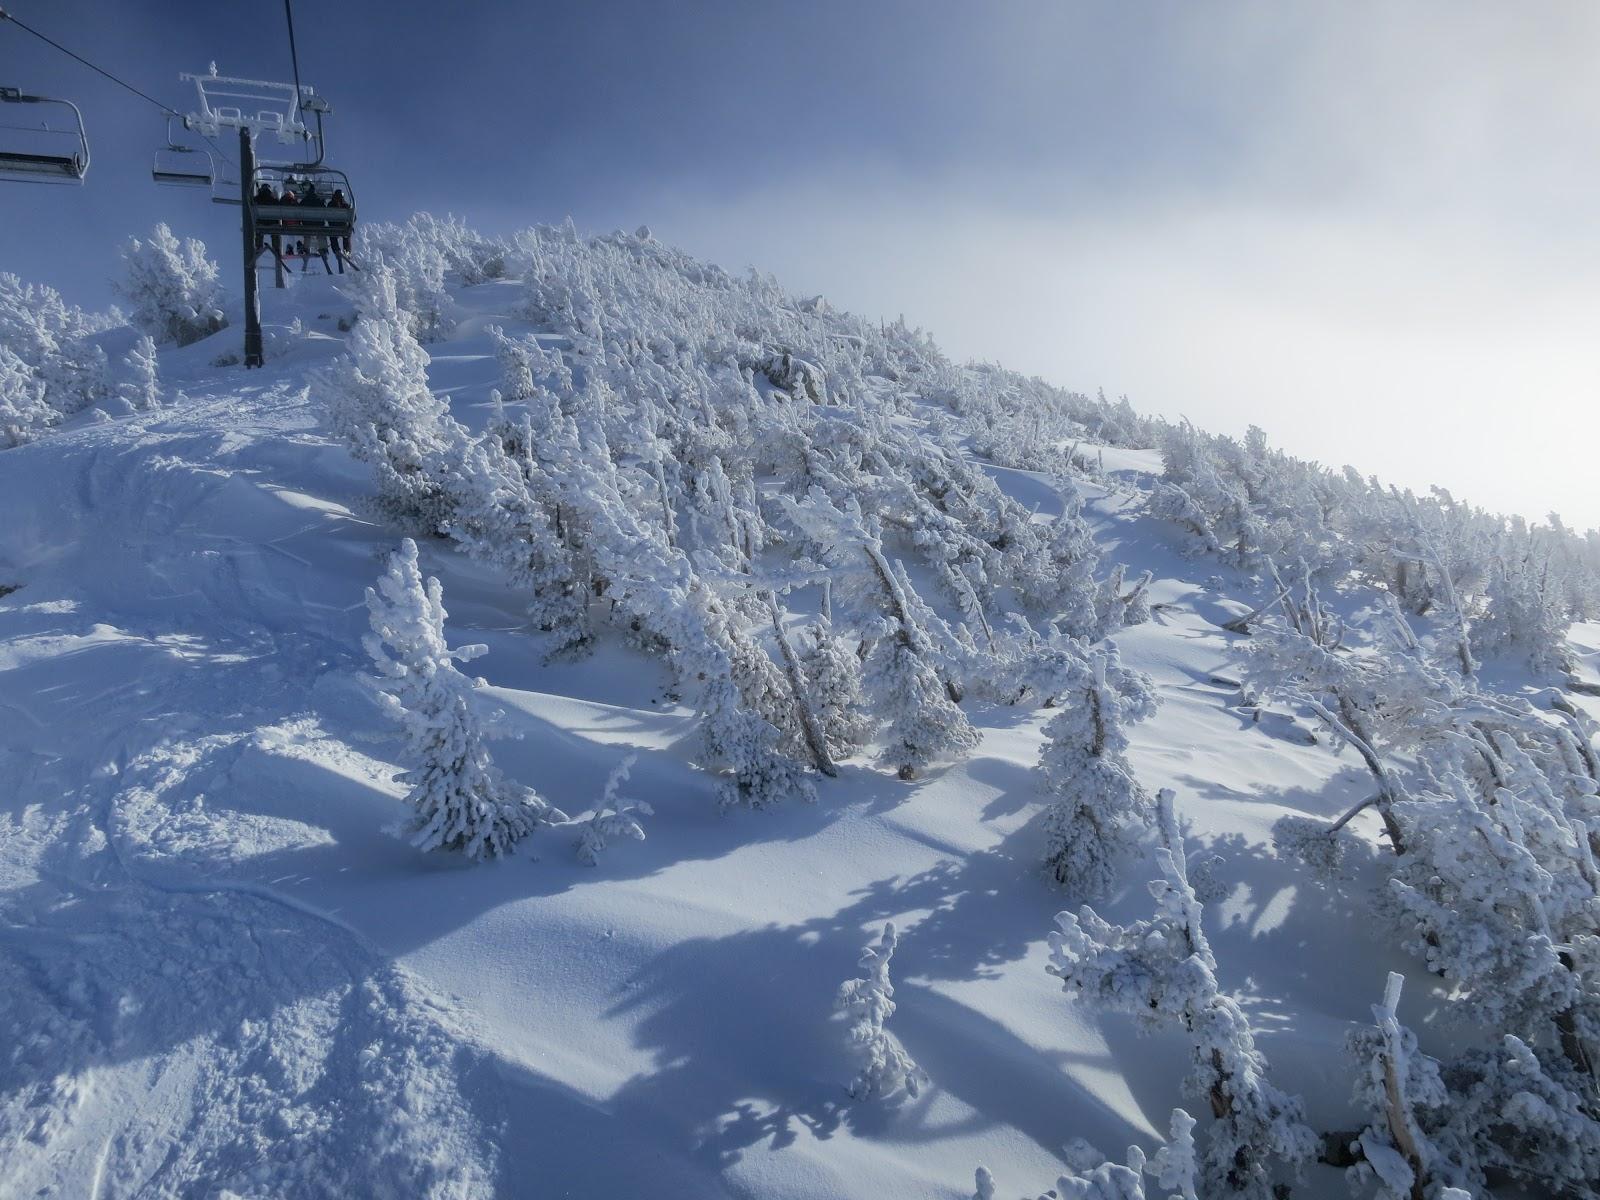 Farshid S Photos South Lake Tahoe Heavenly Ski Resort December 2012